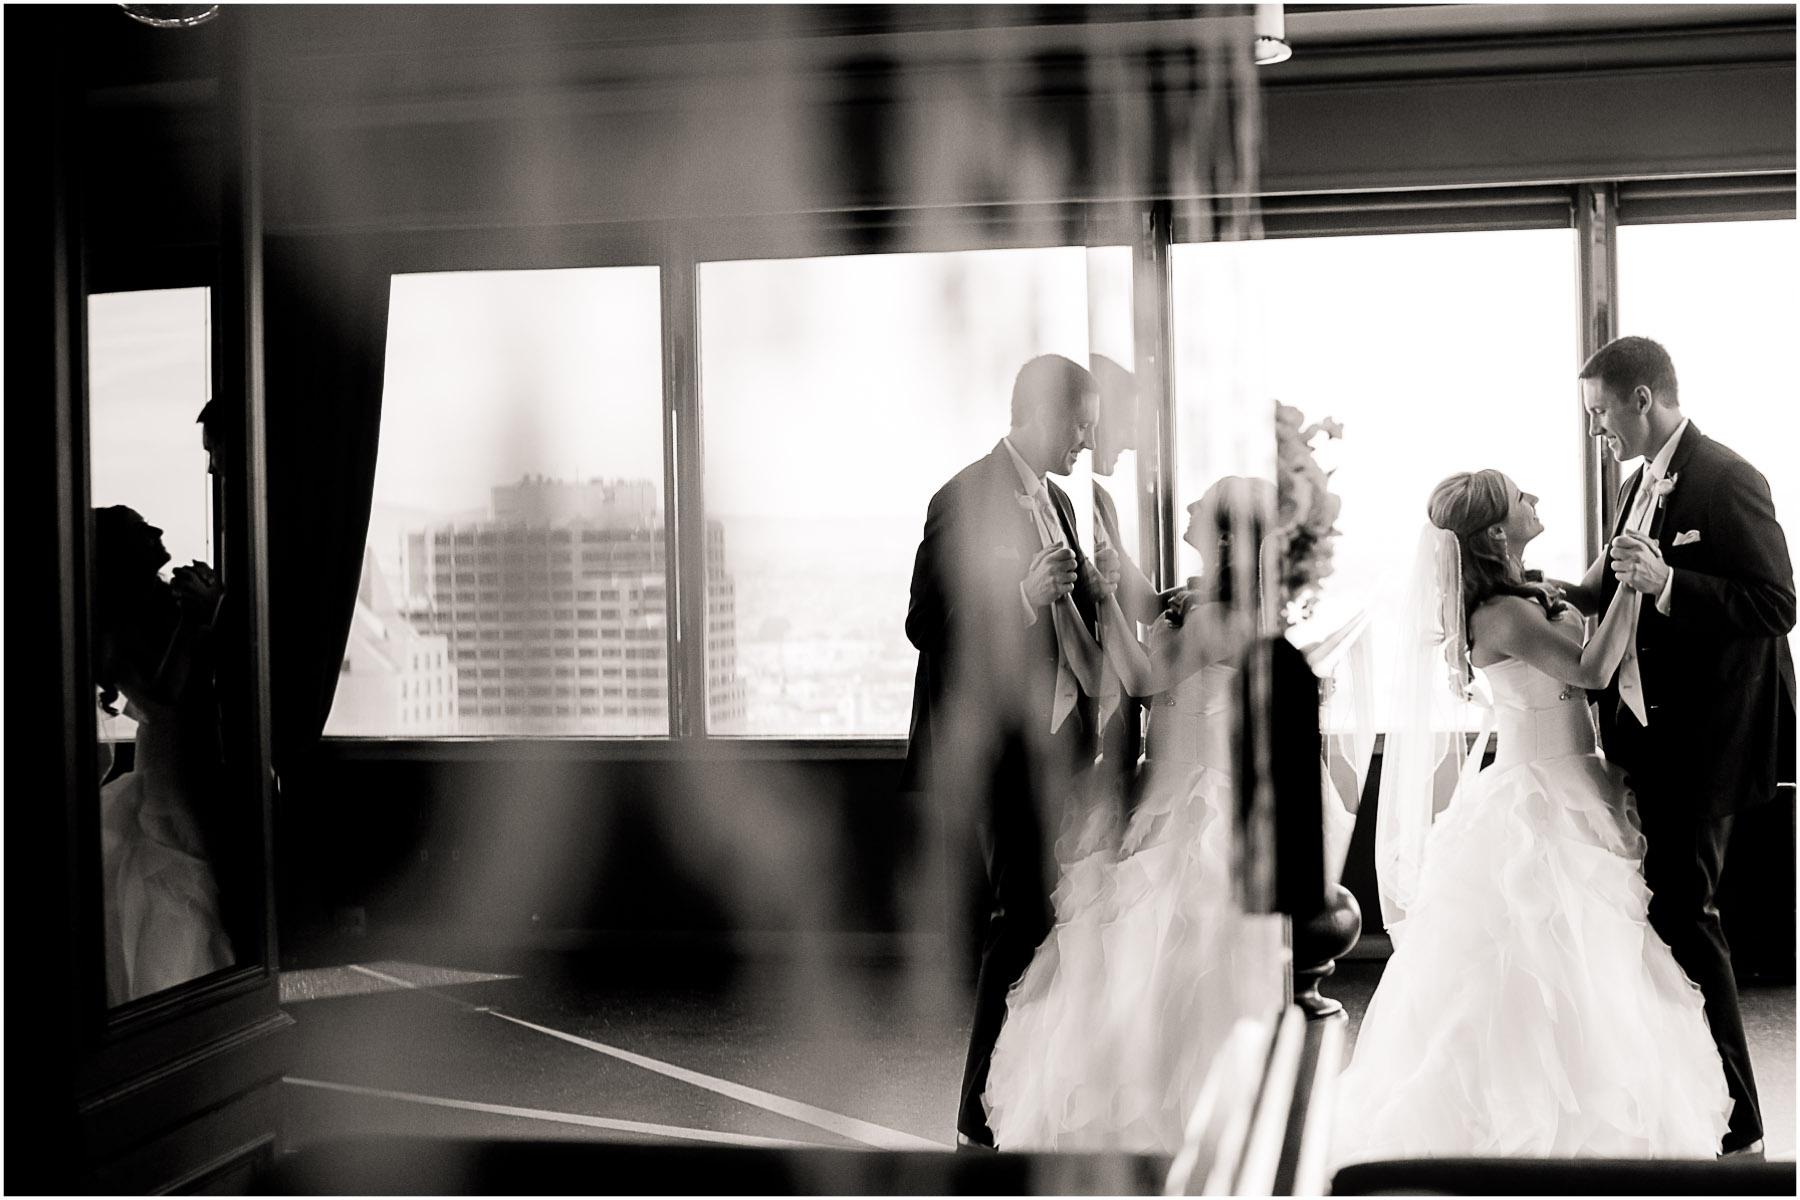 JennaBethPhotography-MJWedding-9.jpg